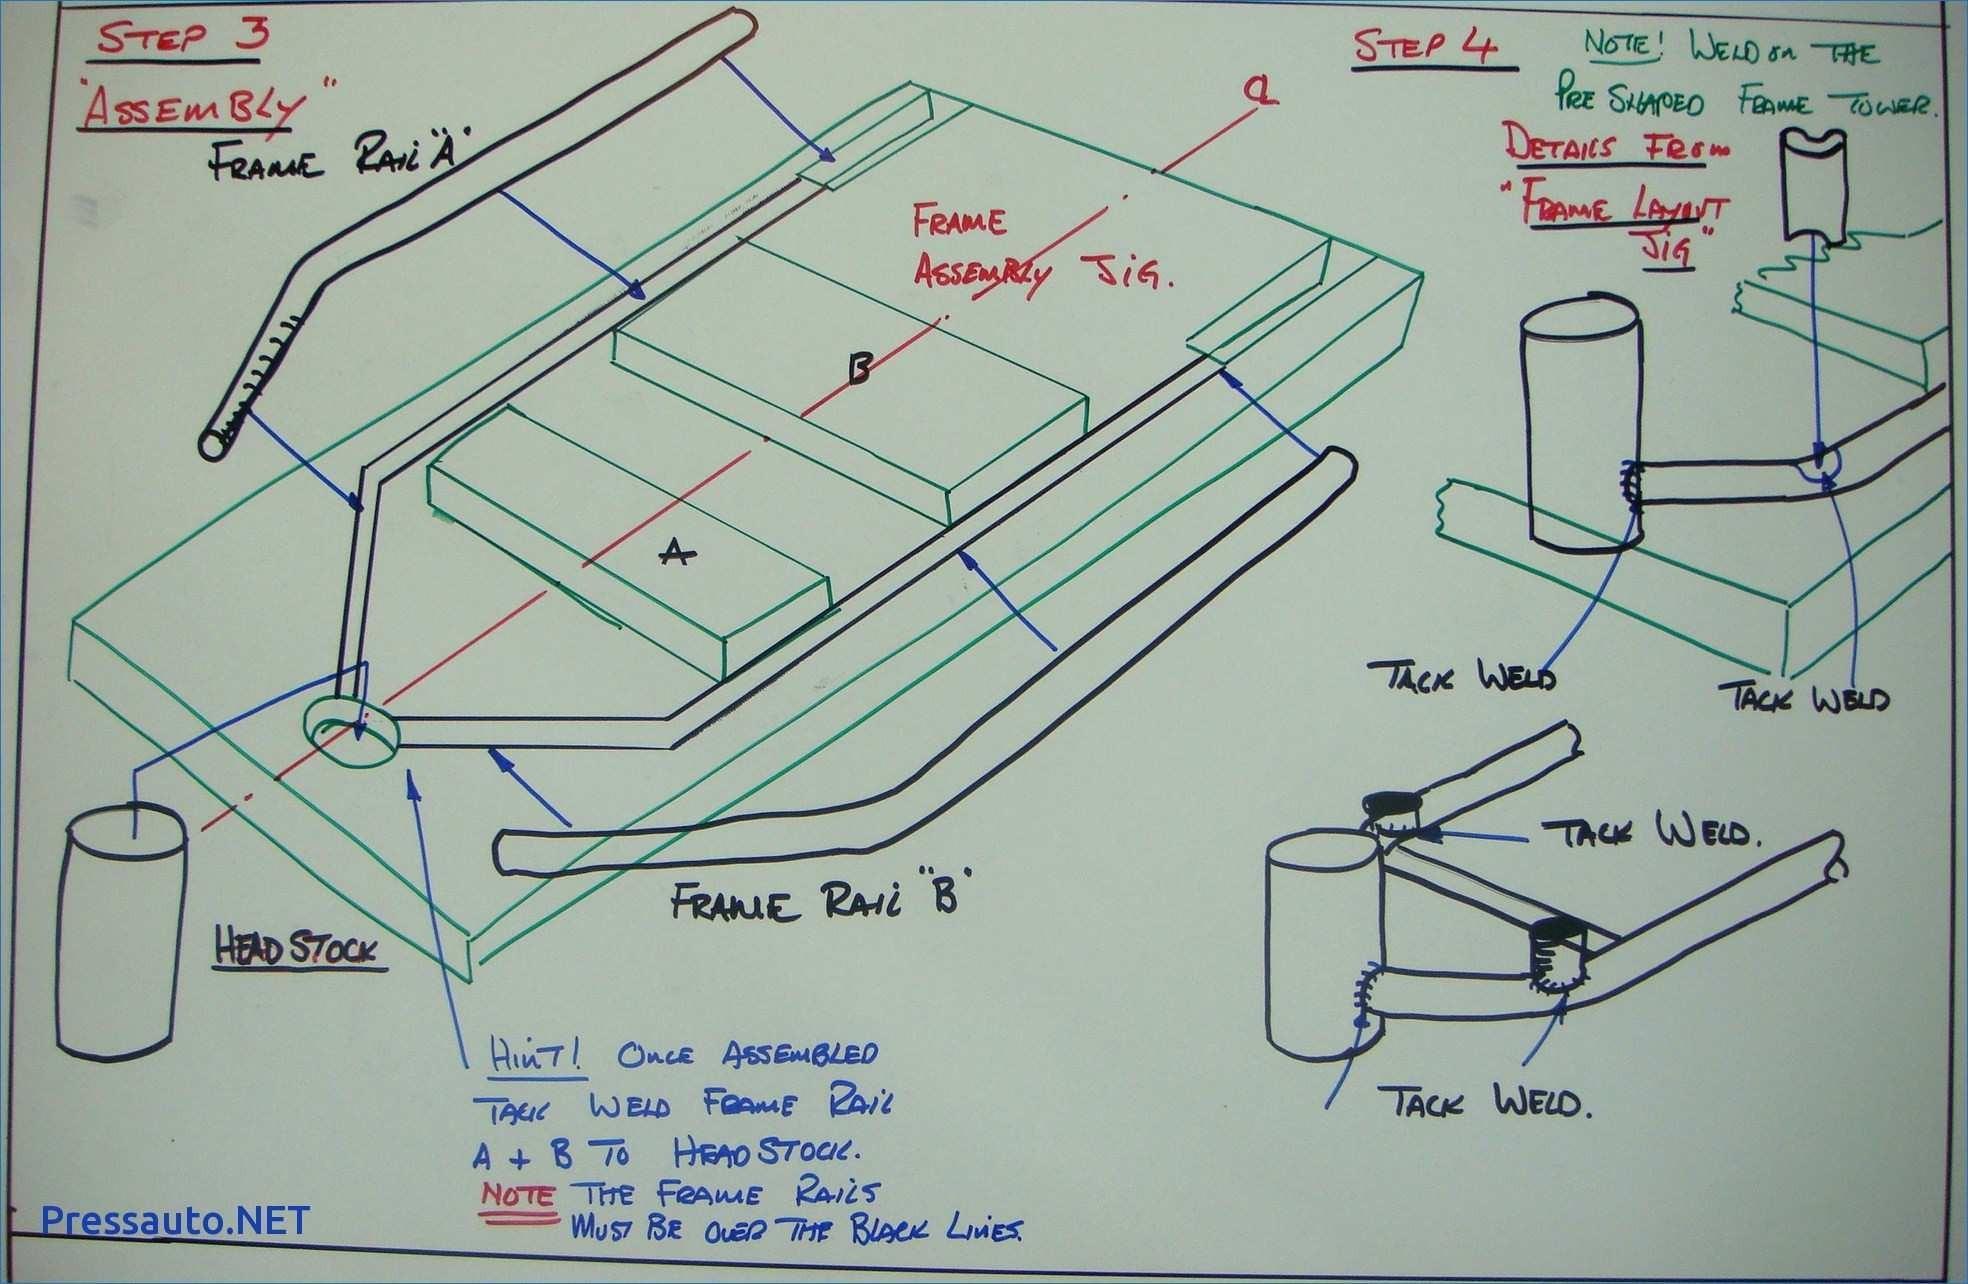 36 Volt Golf Cart Wiring Diagram Best Wiring Cell Switch Diagram for Taylor Dunn Golf